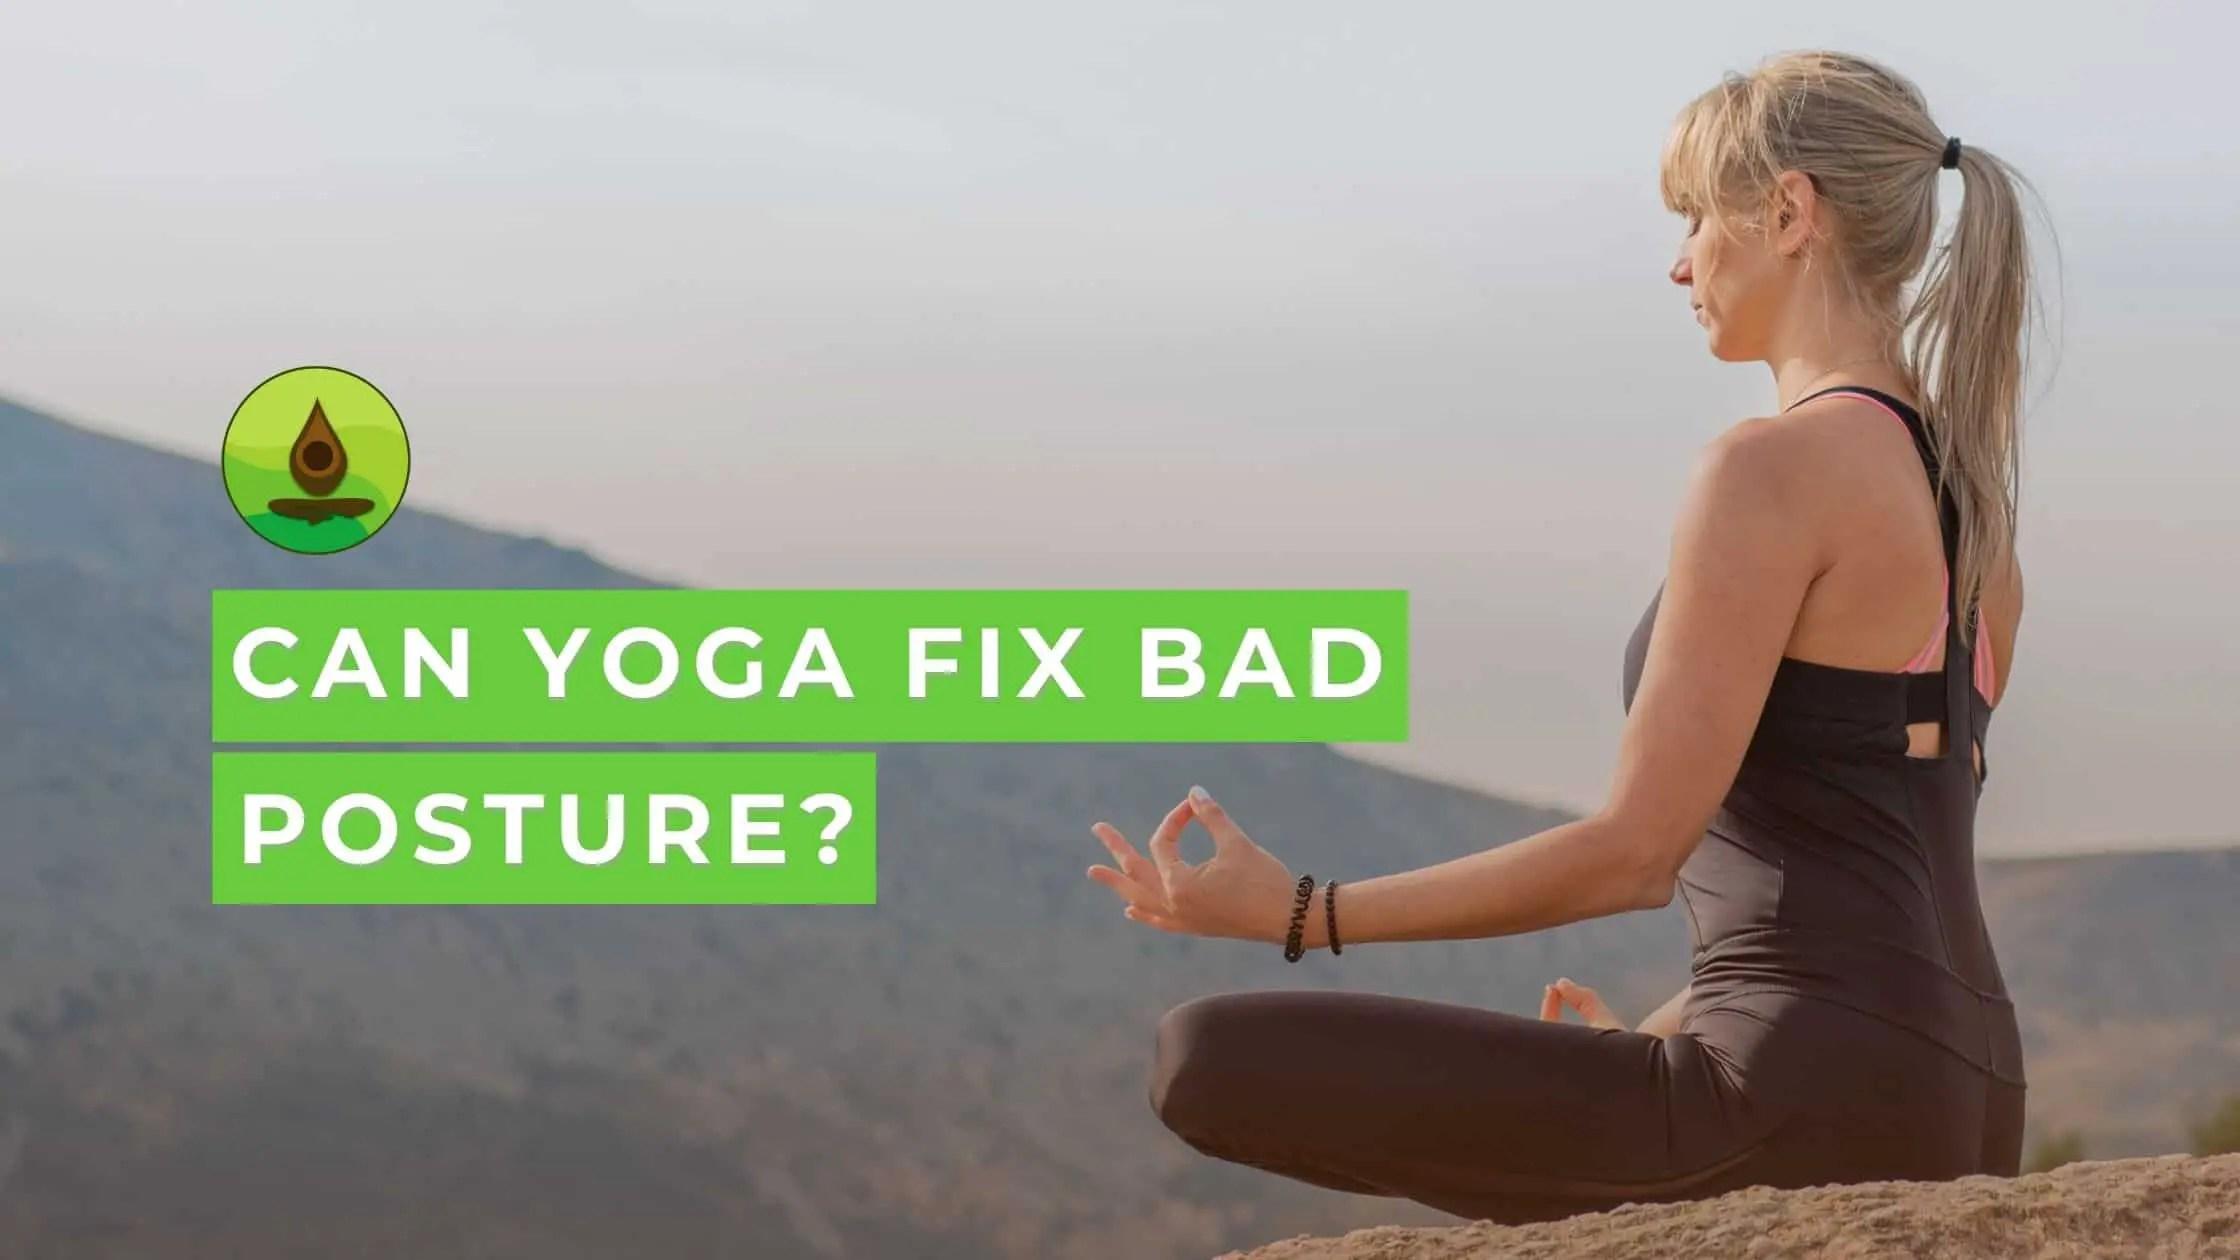 Yoga Bad Posture